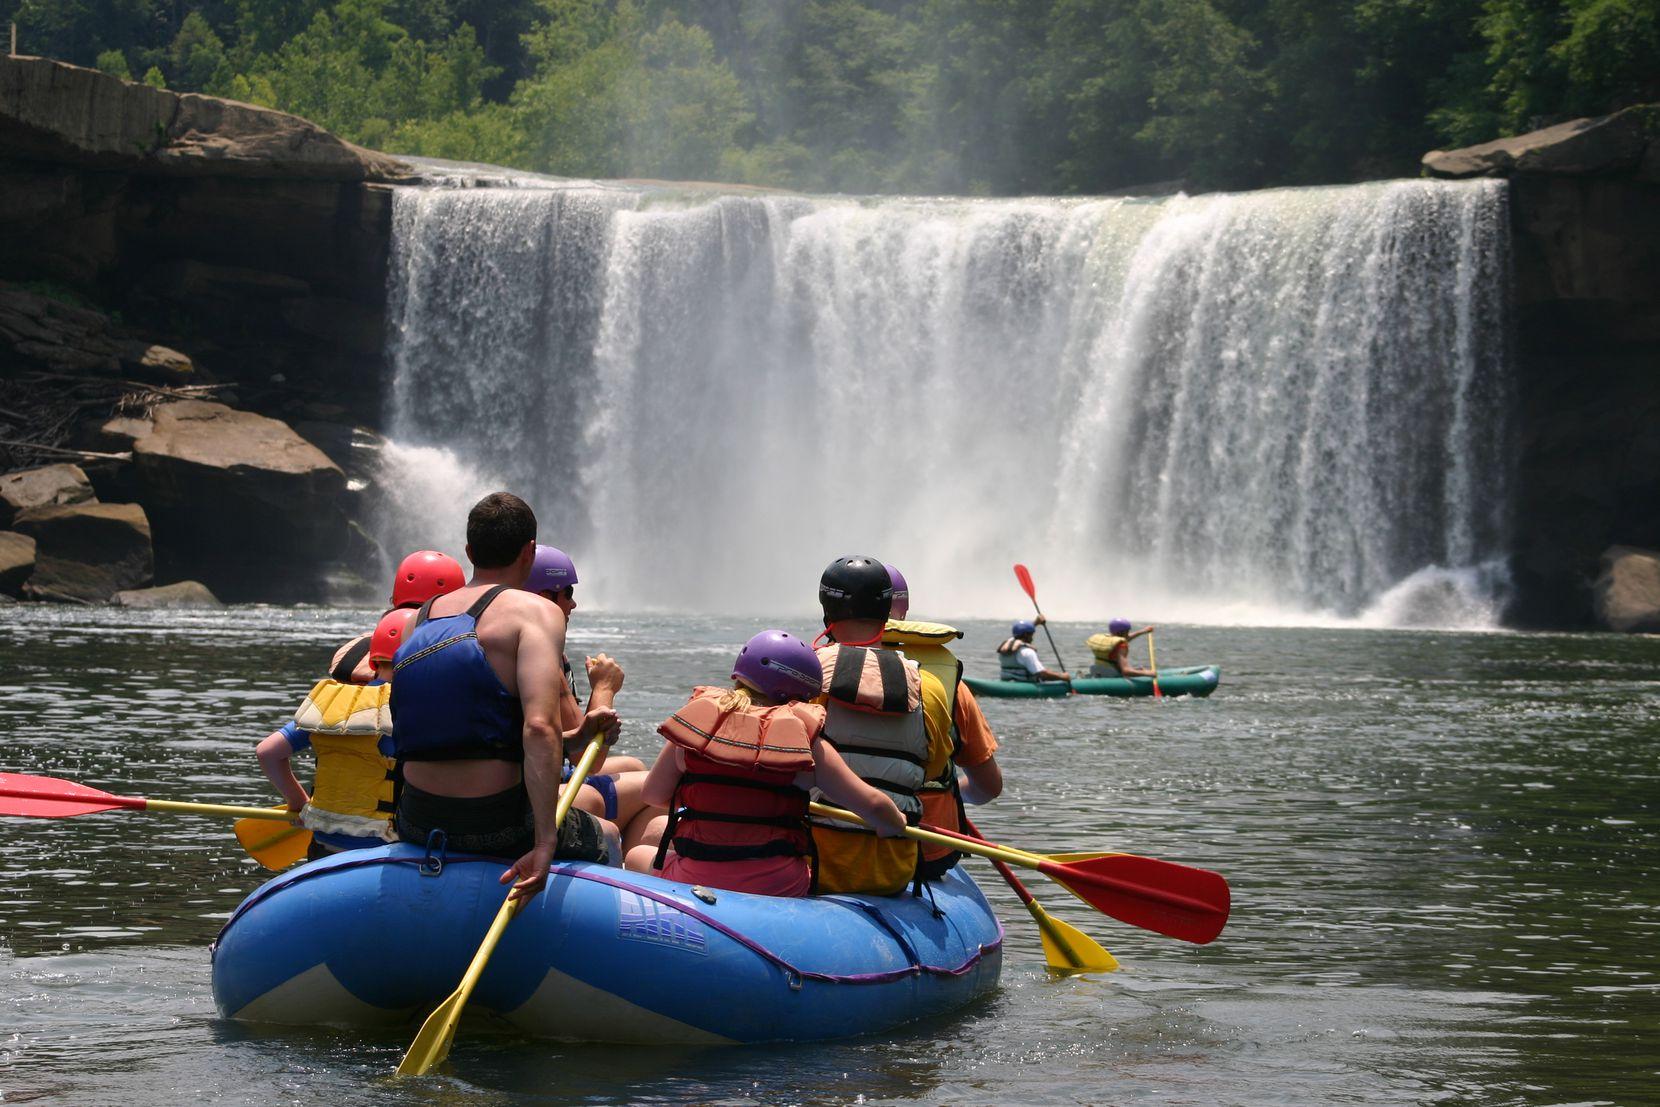 Visitors enjoy rafting near the base of Cumberland Falls in Kentucky.